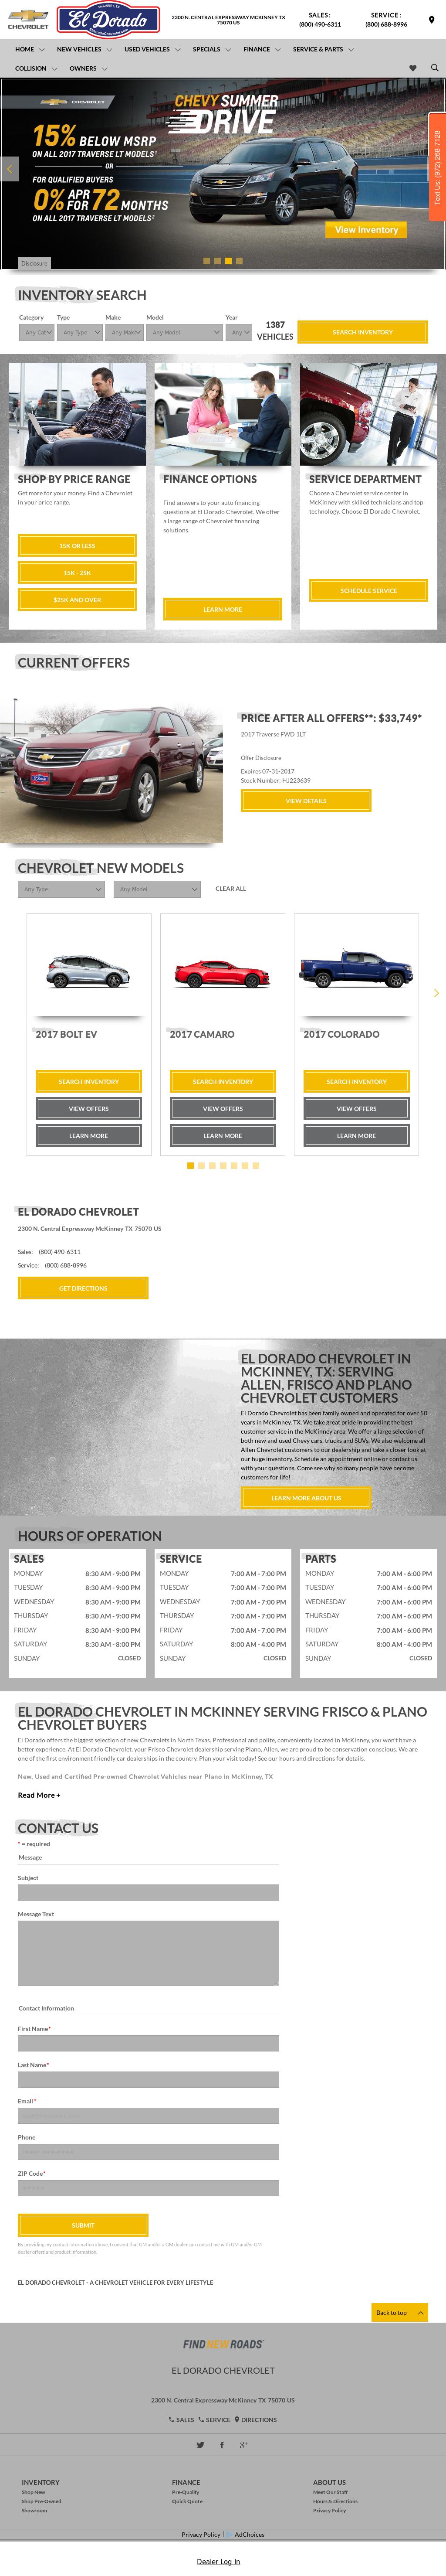 El Dorado Chevrolet Mckinney Texas Website History